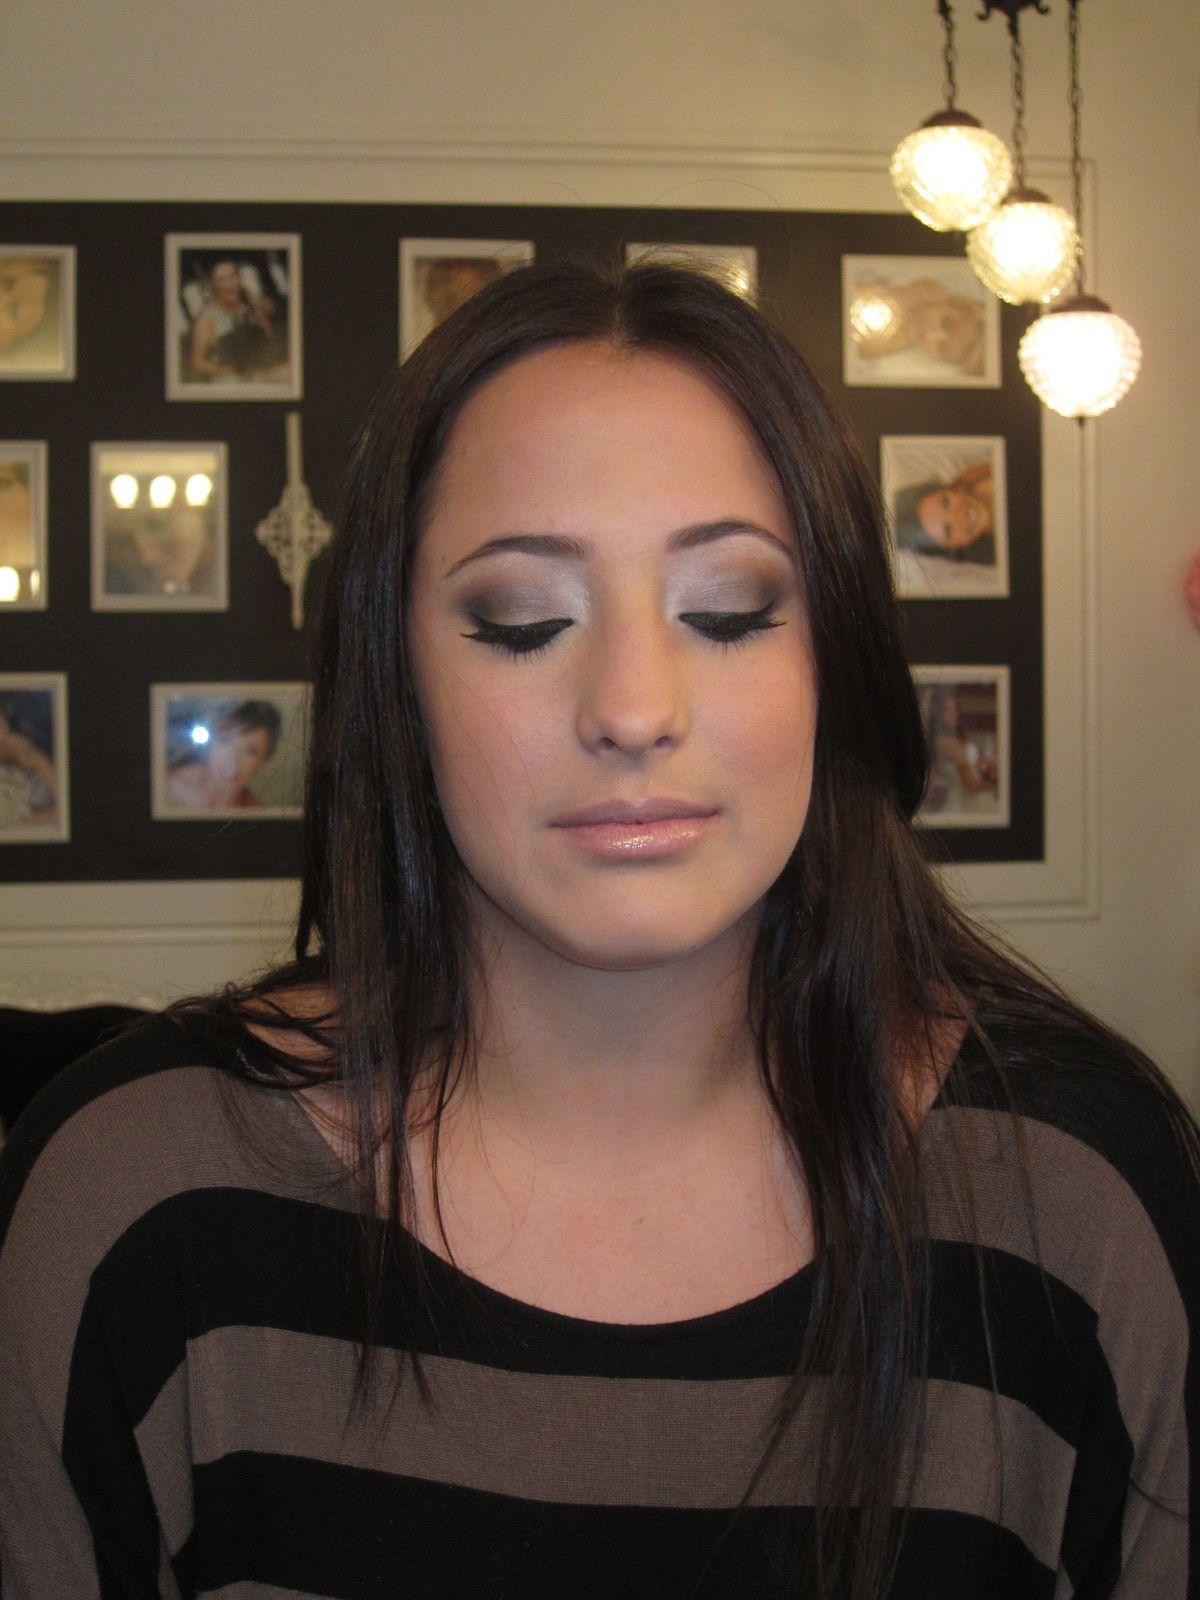 Audrey Bethards Hair & Makeup Artists Services Washington